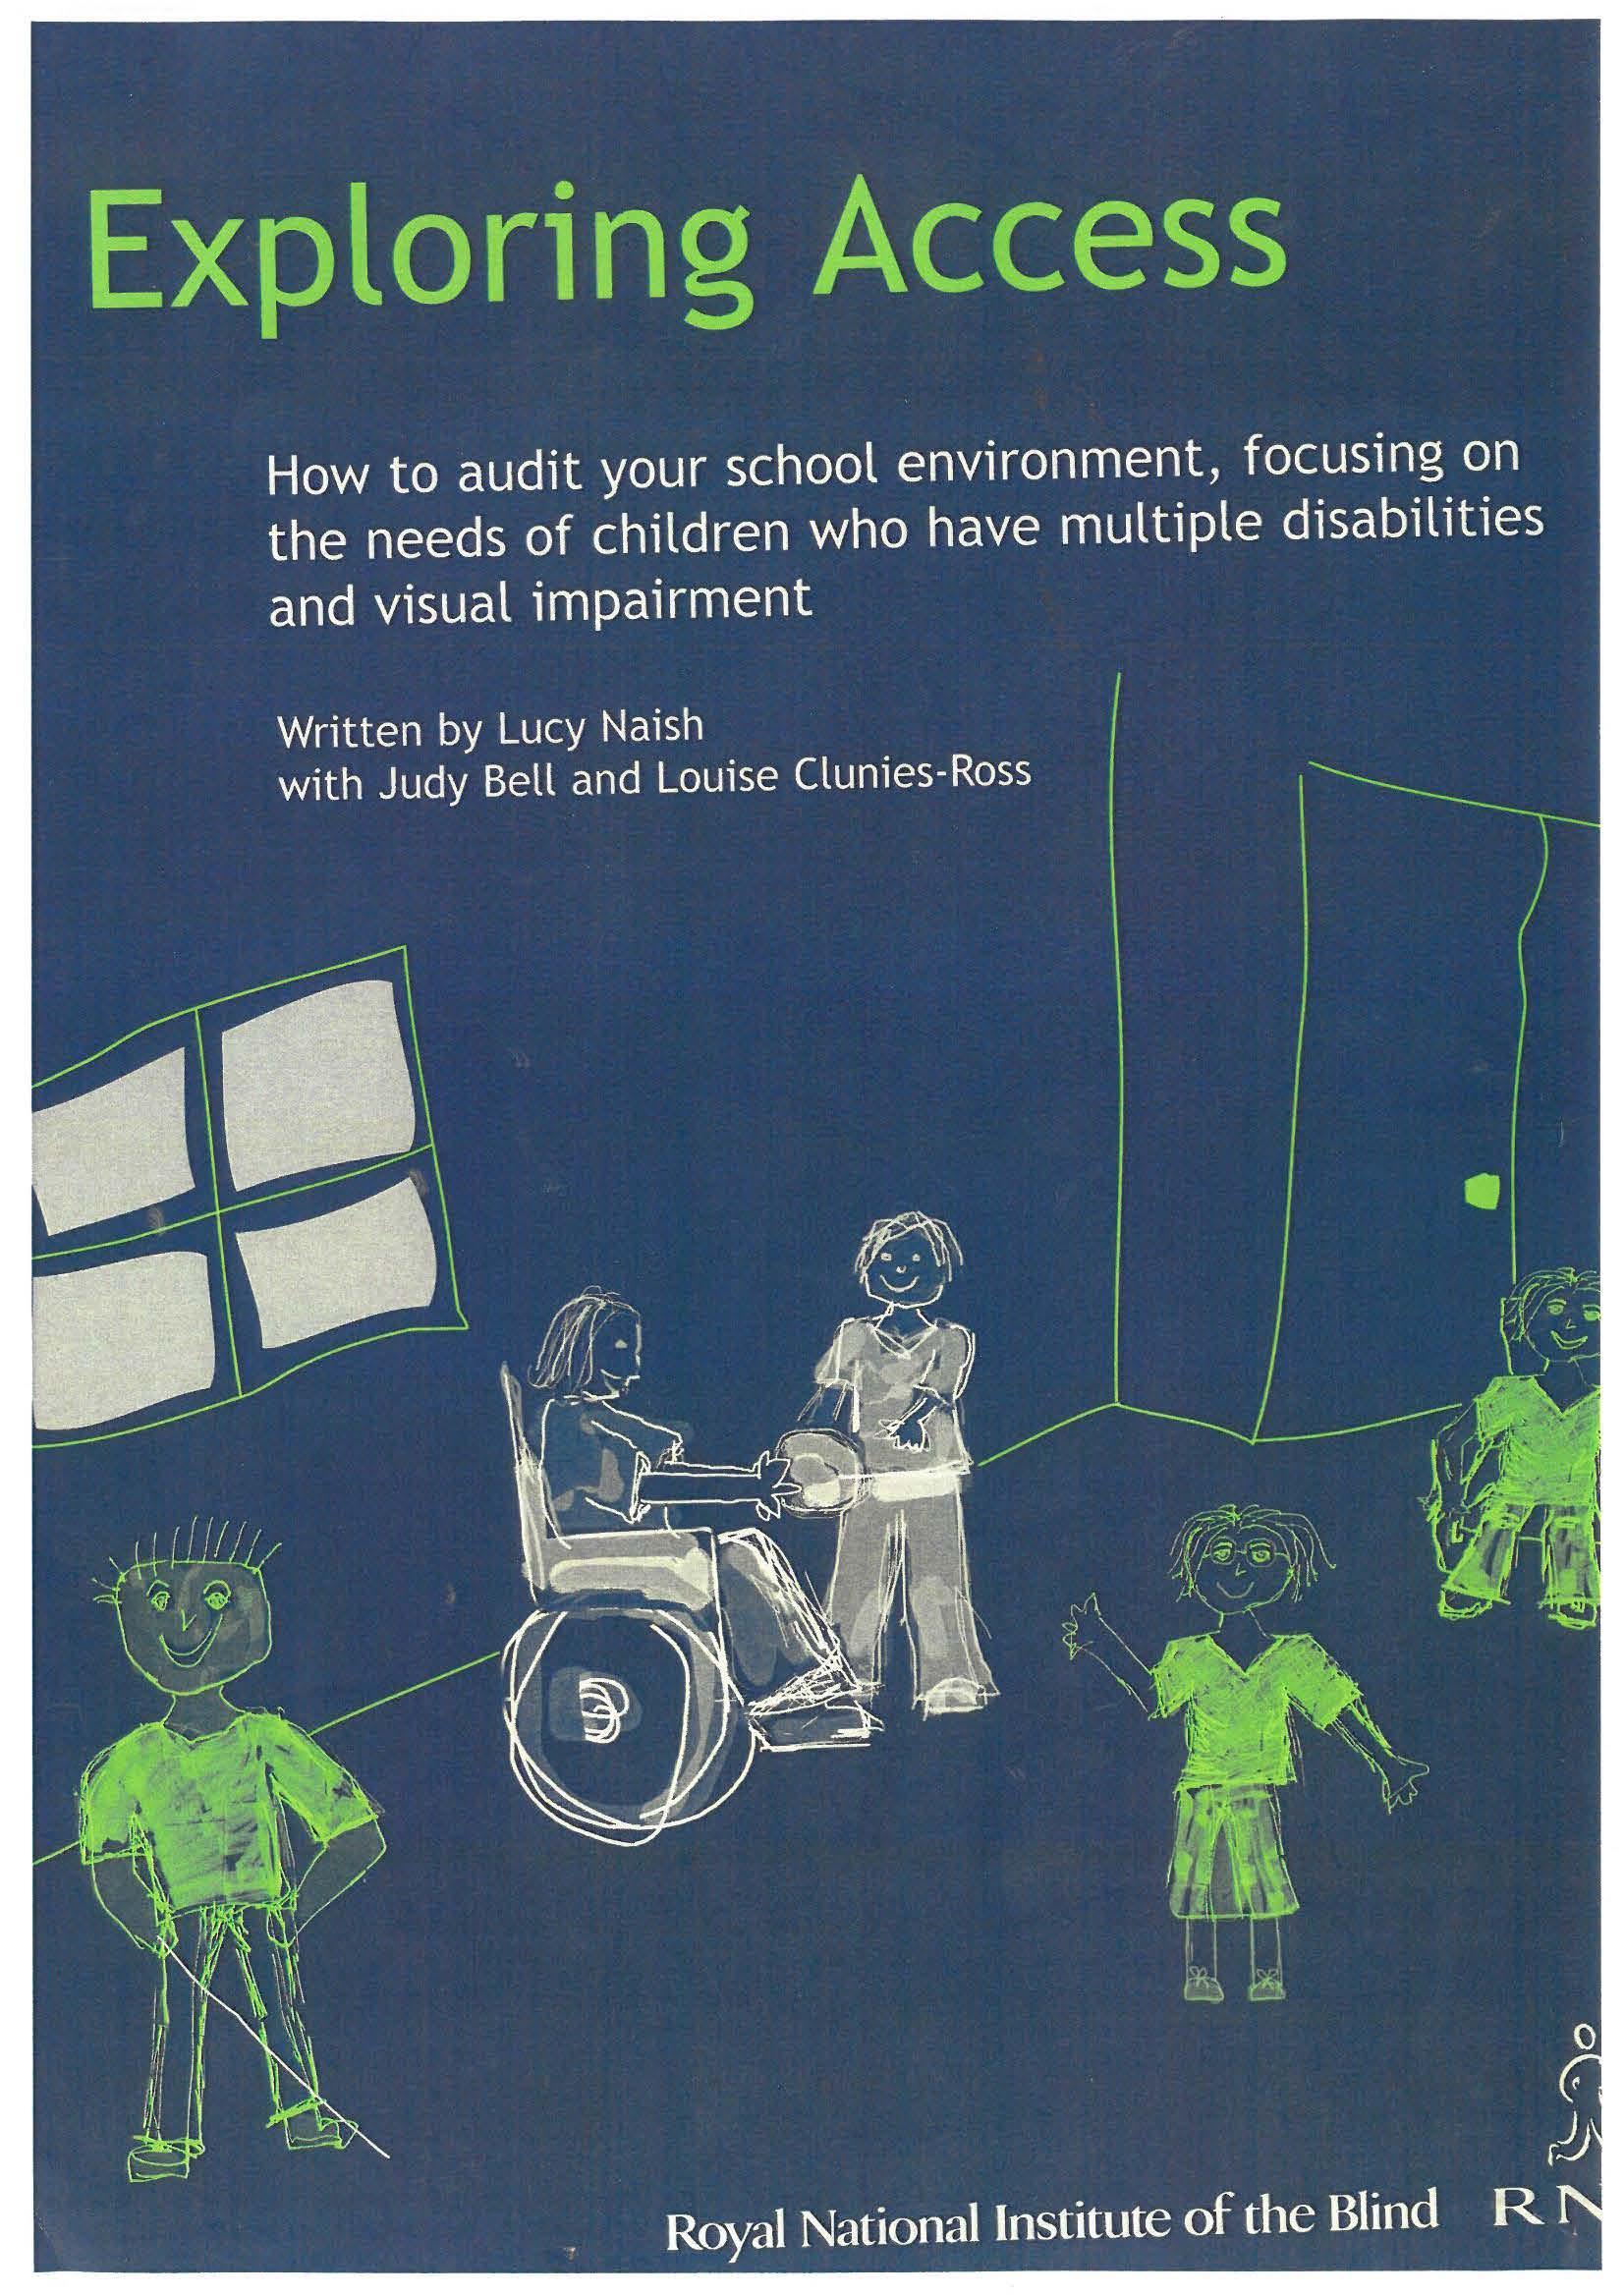 Book cover of RNIB's 'Exploring Access' book